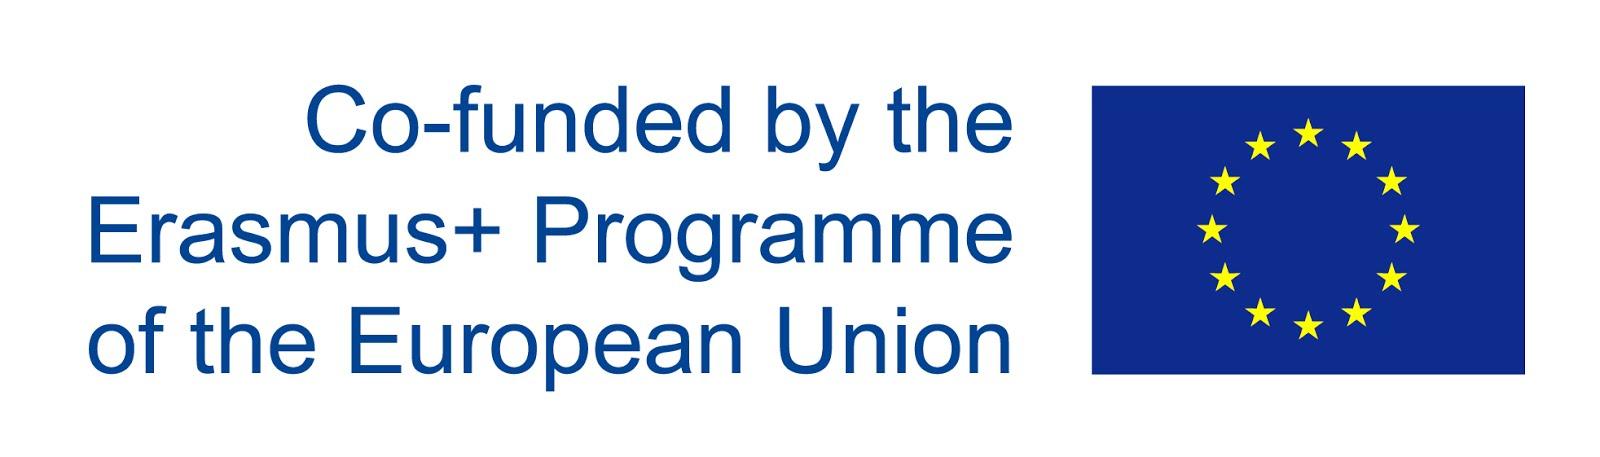 More about Erasmus + Programme